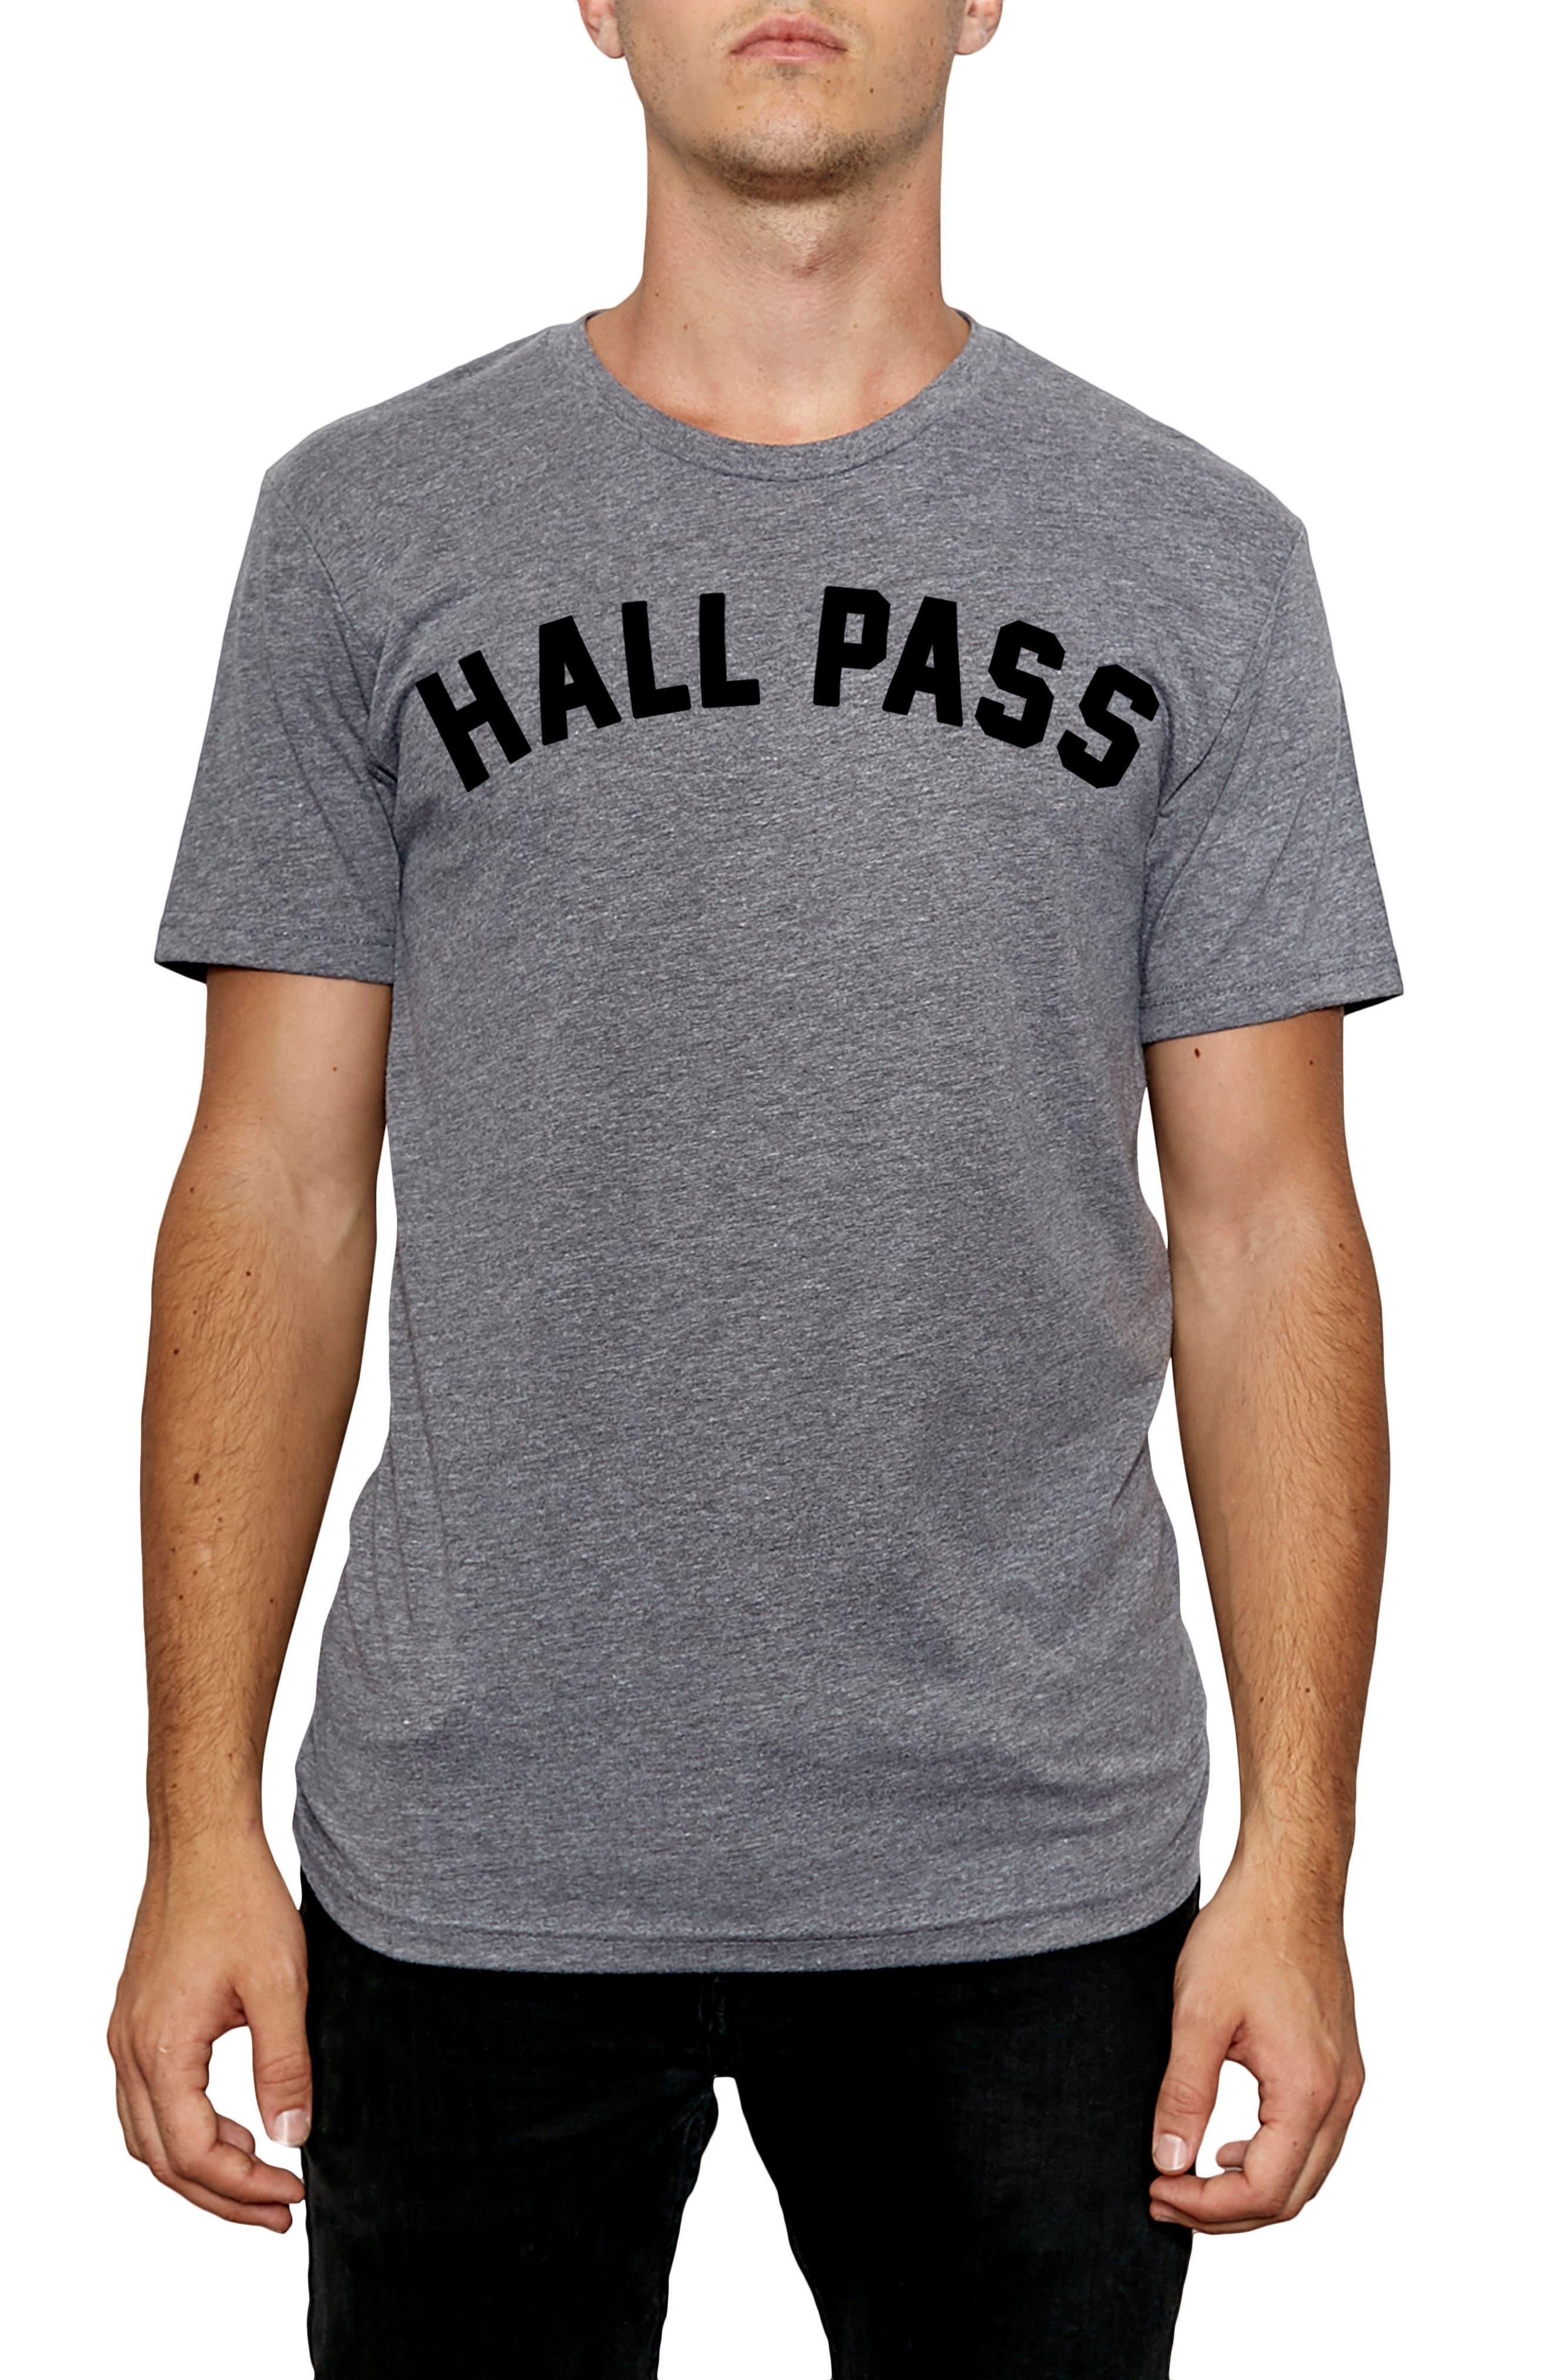 Alternate Image 1 Selected - Kid Dangerous Hall Pass T-Shirt